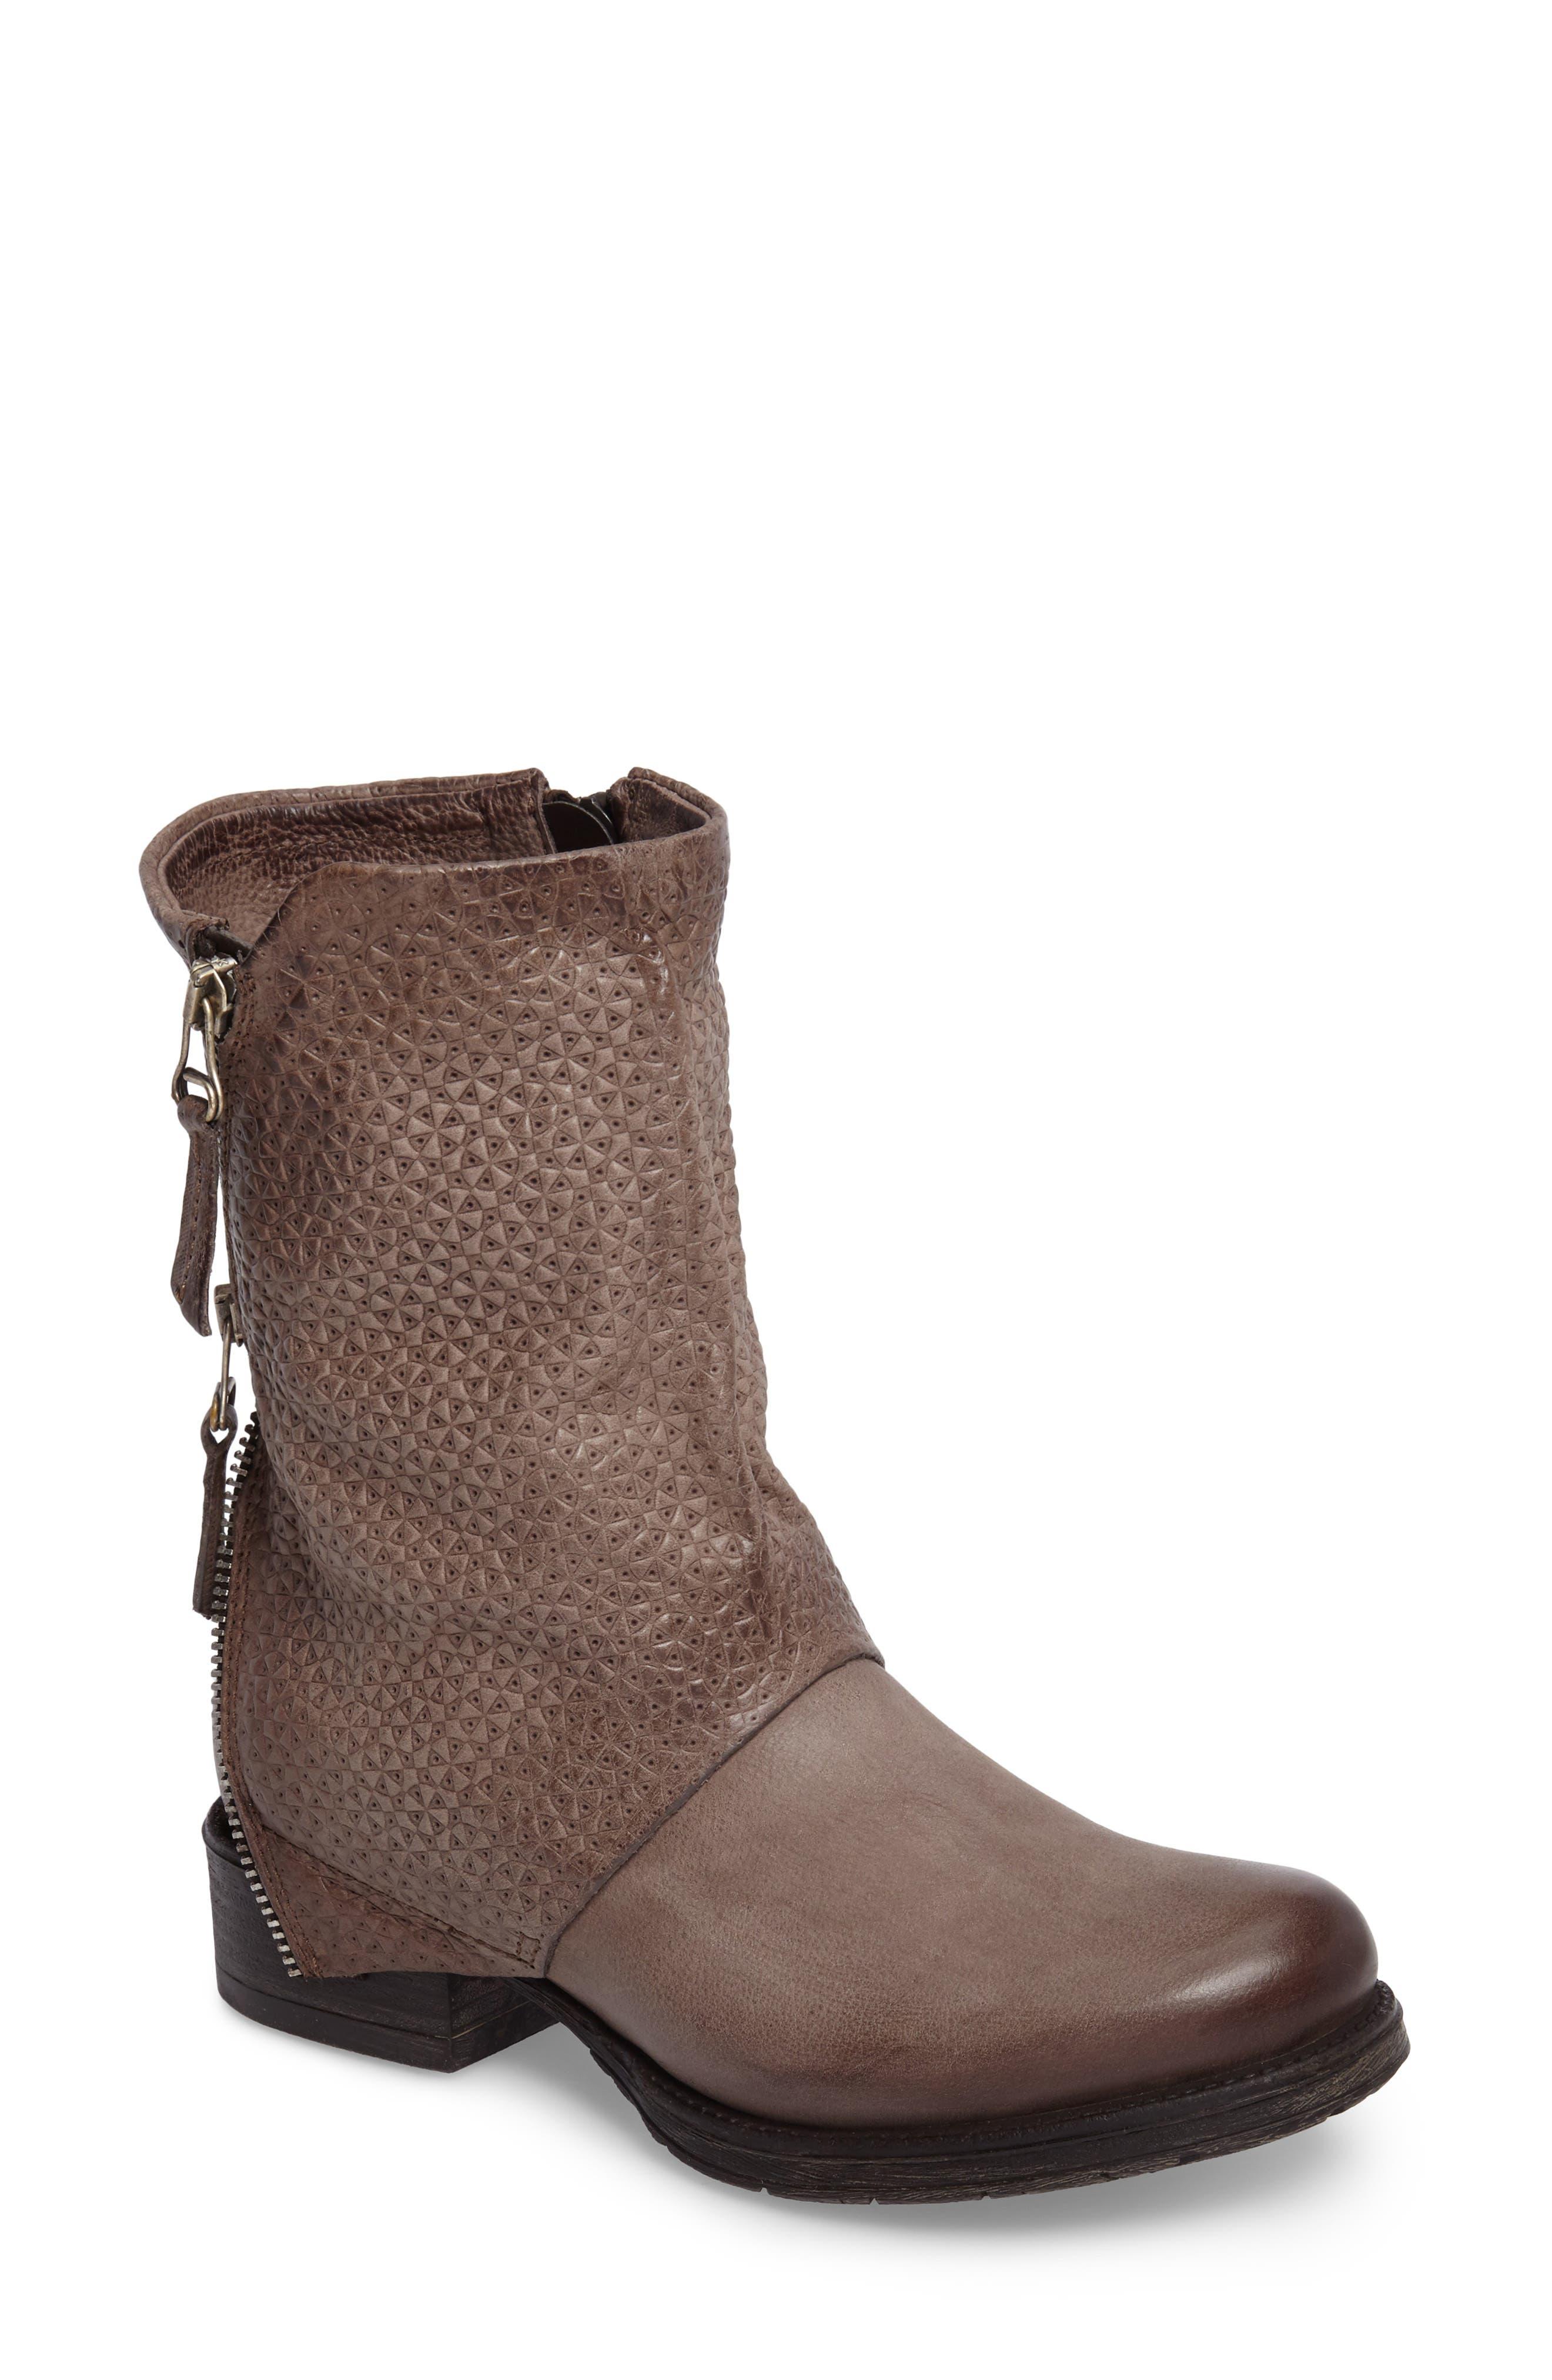 Miz Mooz Nugget Asymmetrical Textured Boot (Women)